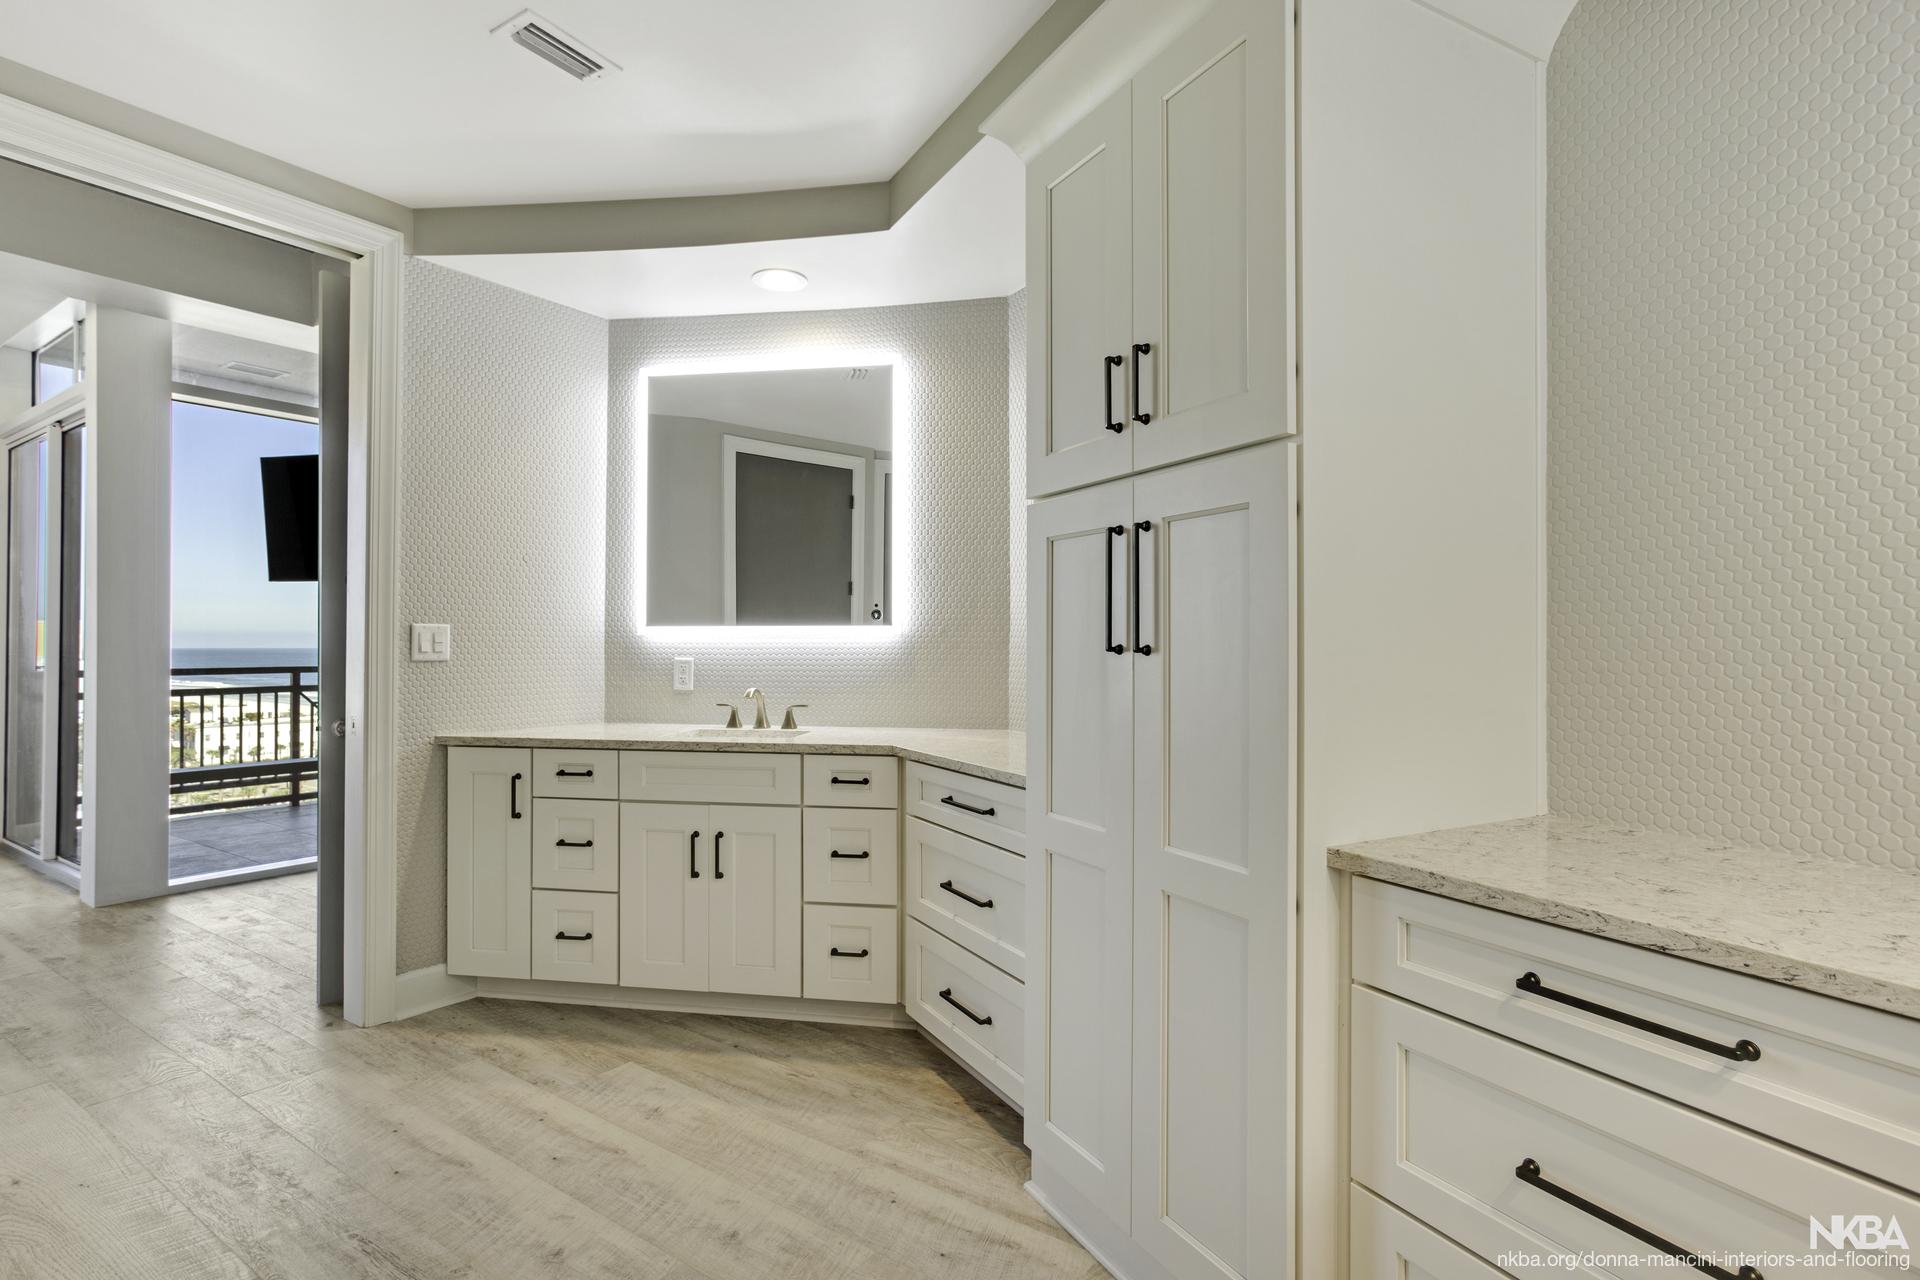 Donna Mancini Interiors & Flooring - 141 Hilden Rd STE 202, Ponte Vedra Beach, FL 32081